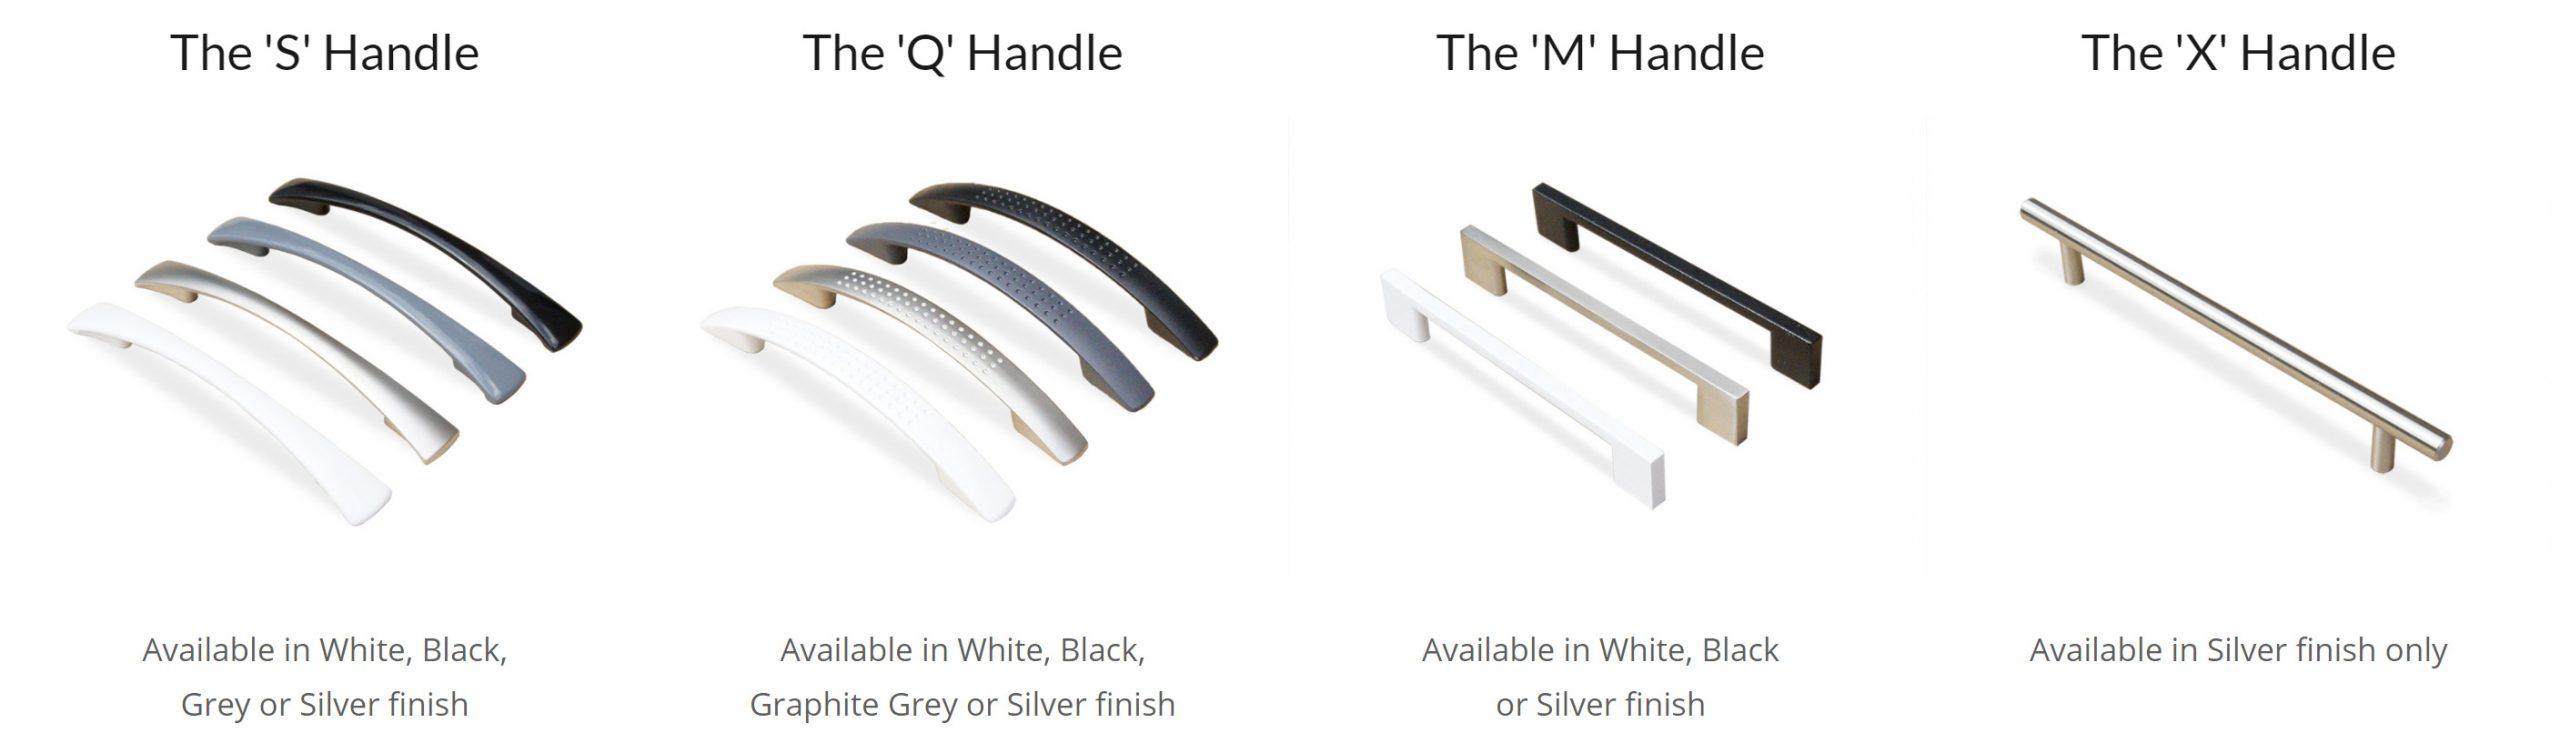 imperial handles